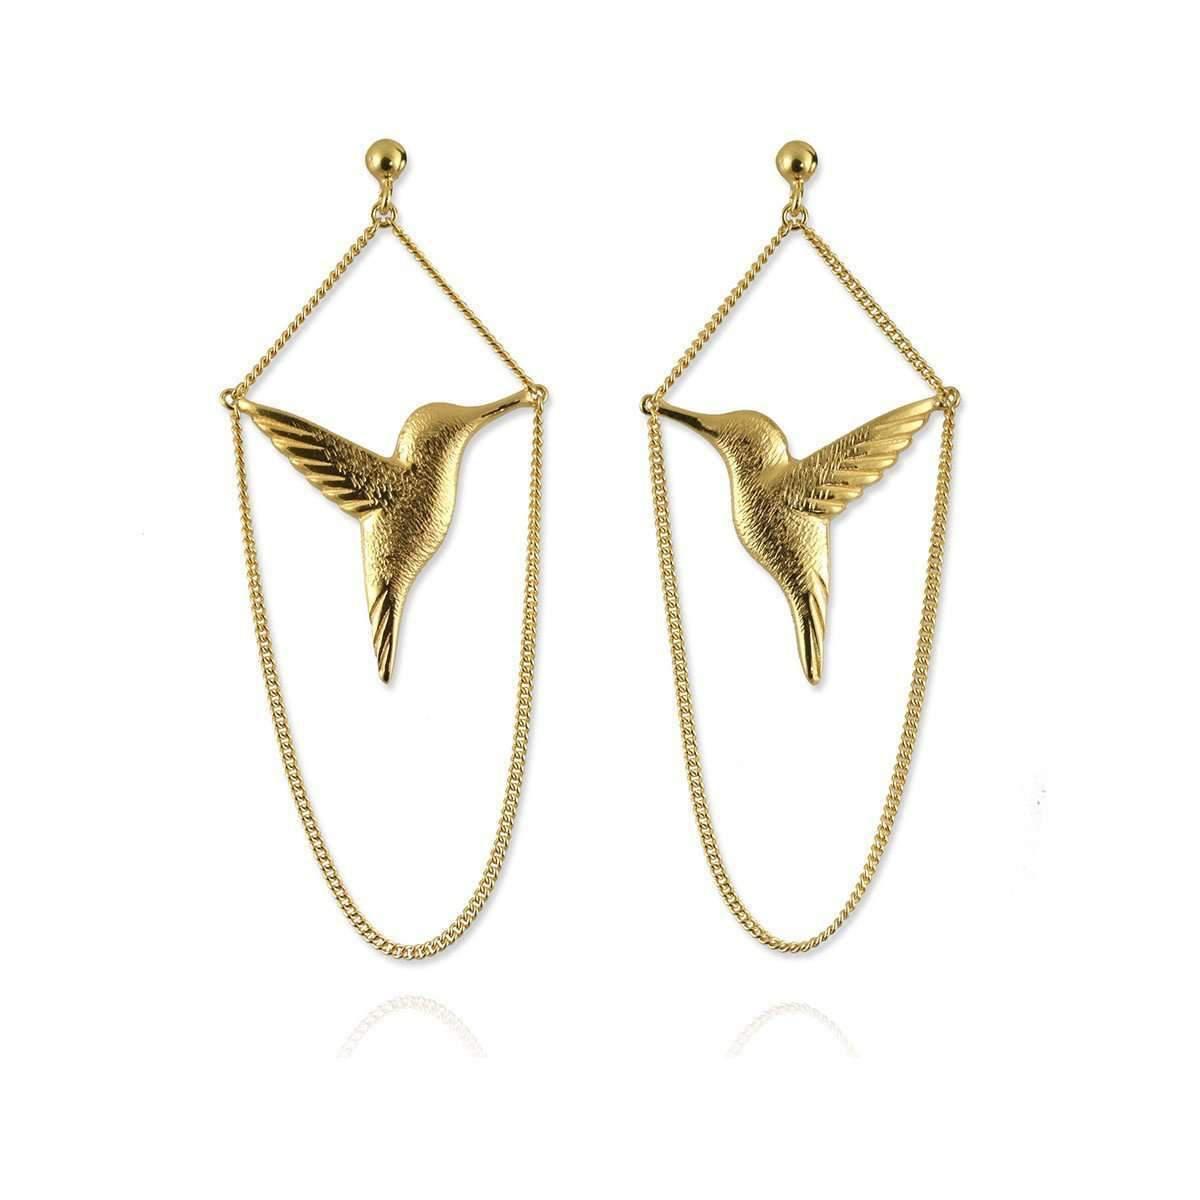 Jana Reinhardt Gold Plated Silver Hummingbird Studs fLcXt3UB99